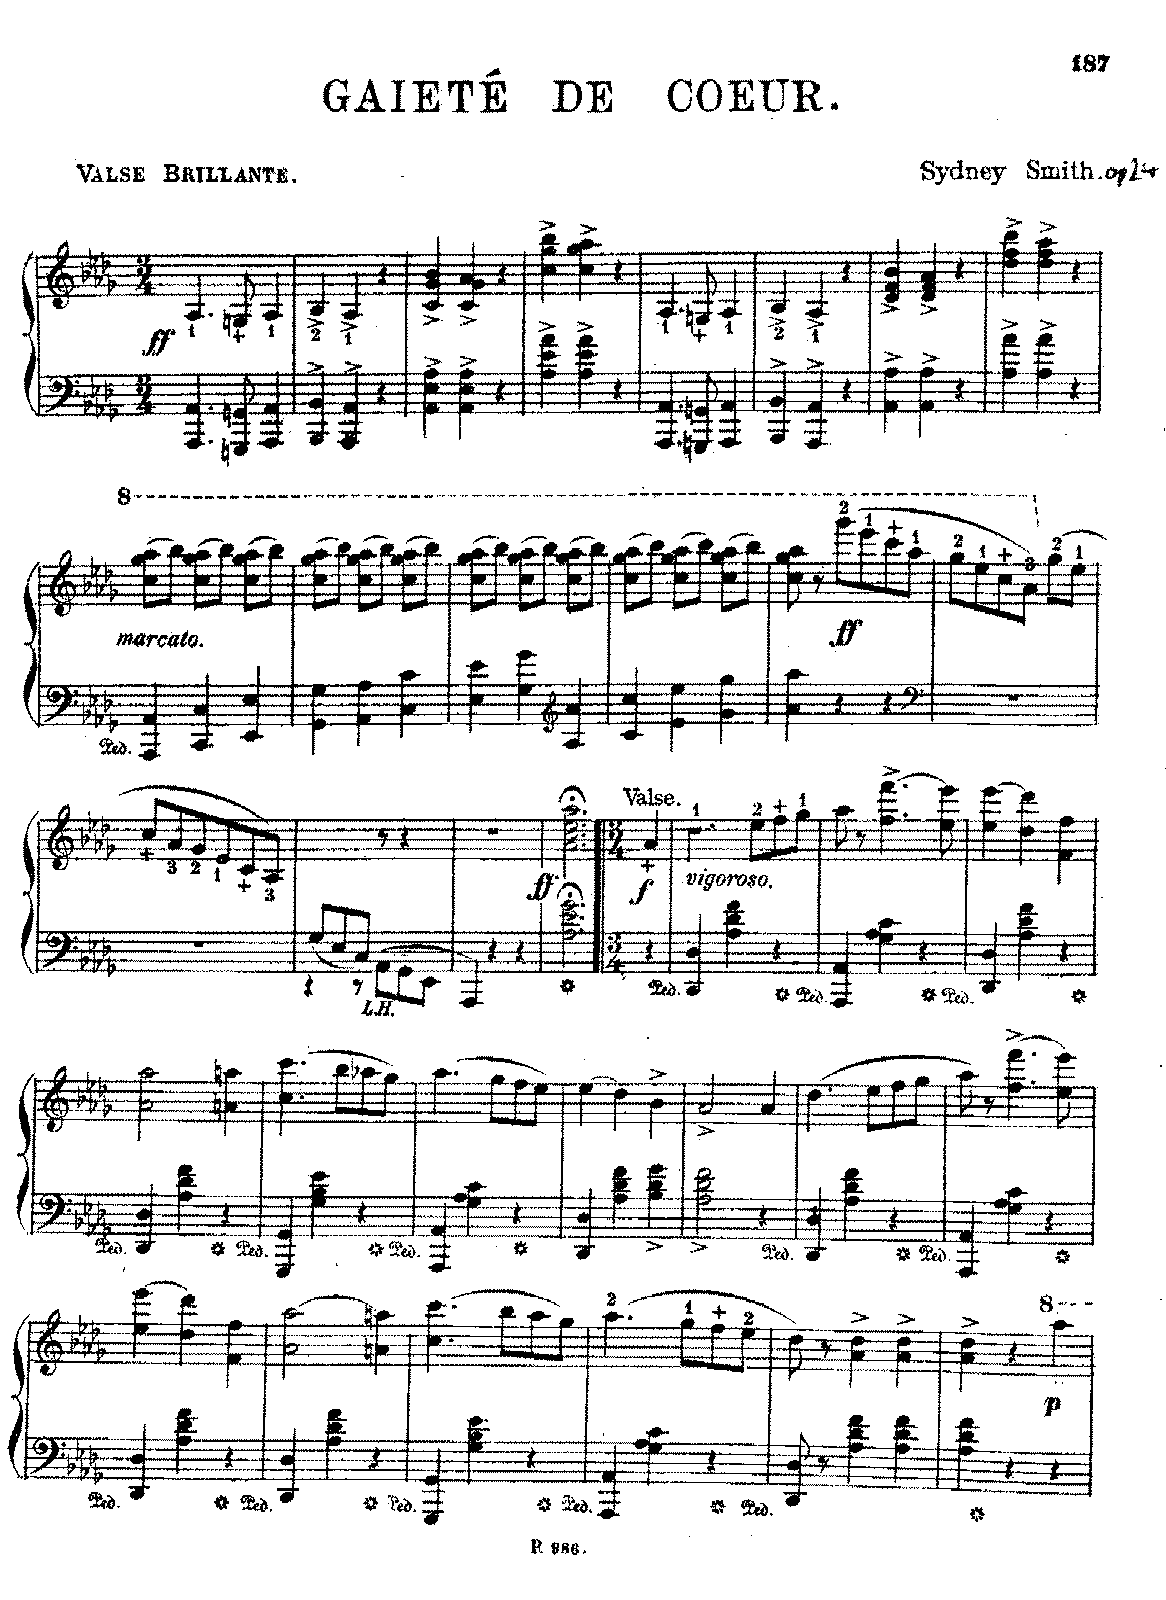 Gaieté de coeur, Op 24 (Smith, Sydney) - IMSLP/Petrucci Music